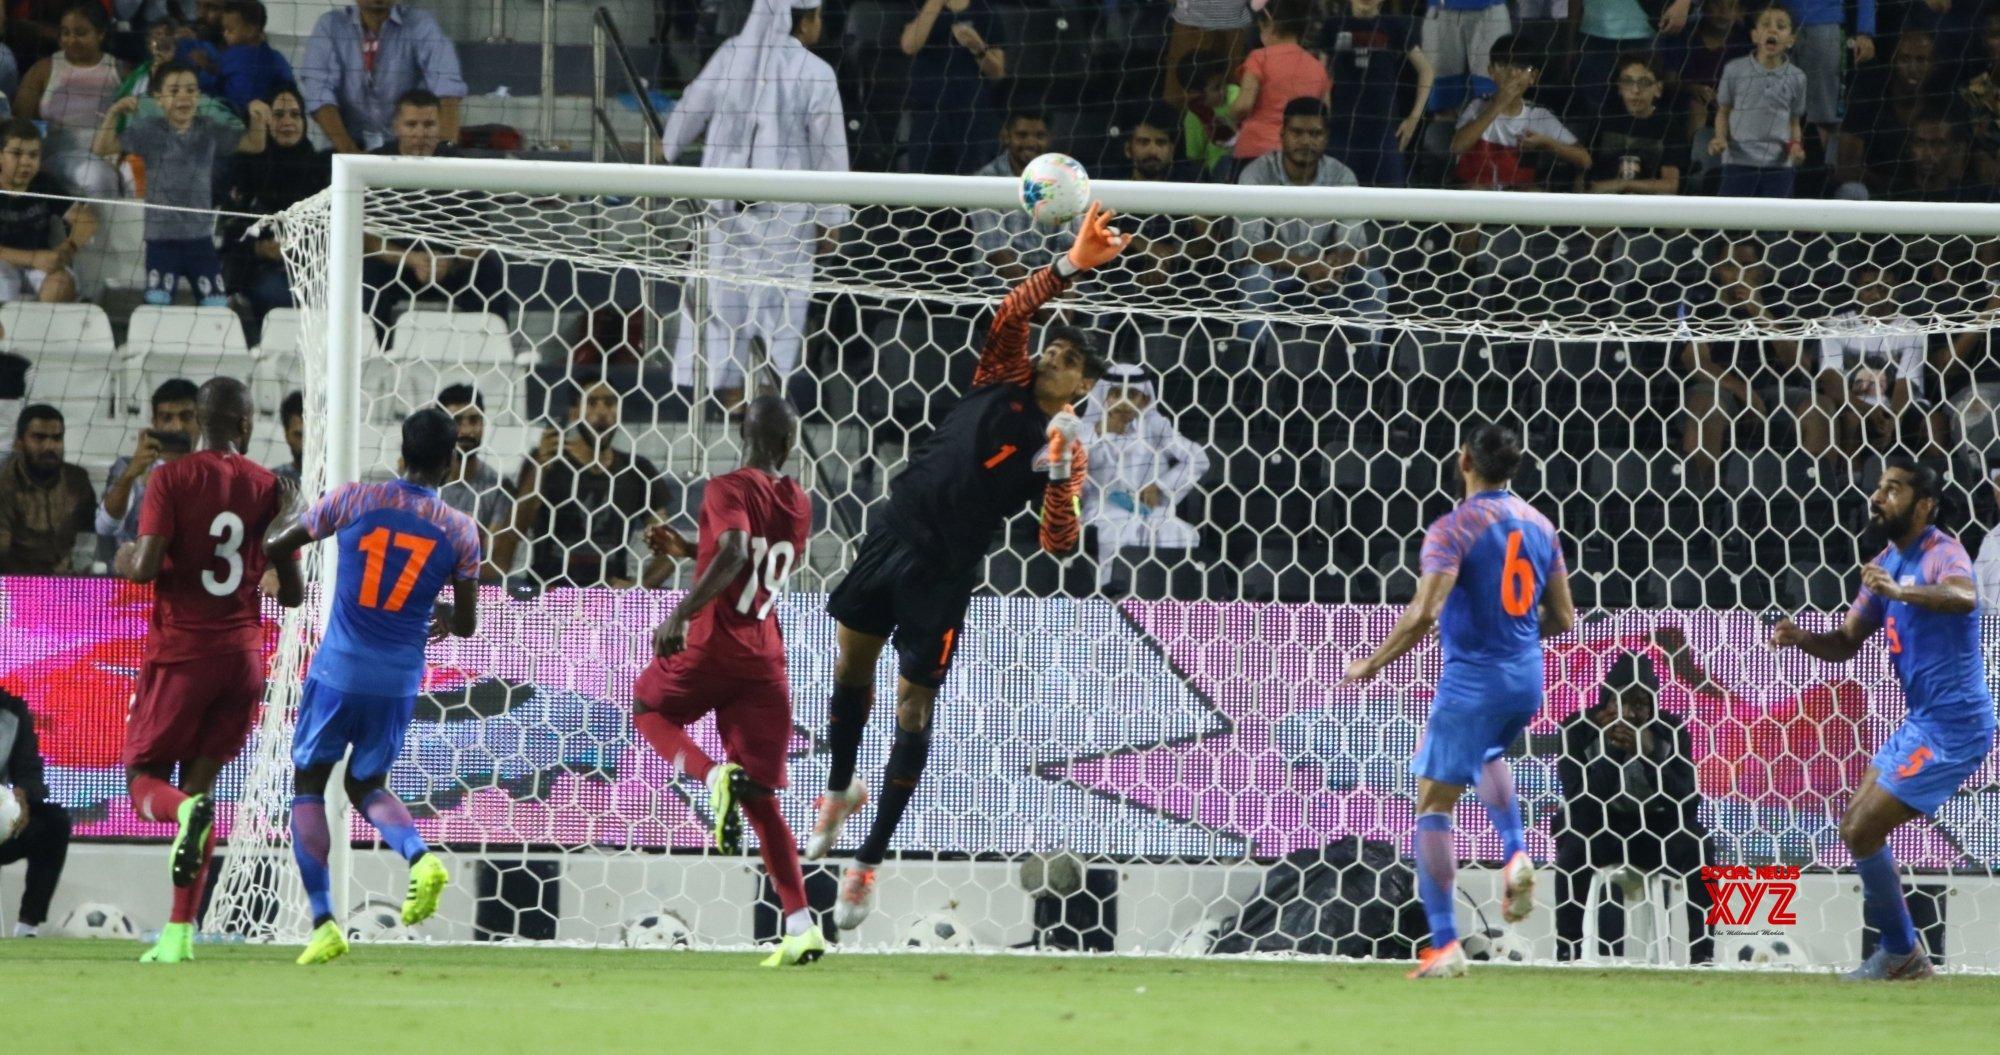 Doha (Qatar): FIFA World Cup Qatar 2022 qualifiers - India Vs Qatar #Gallery